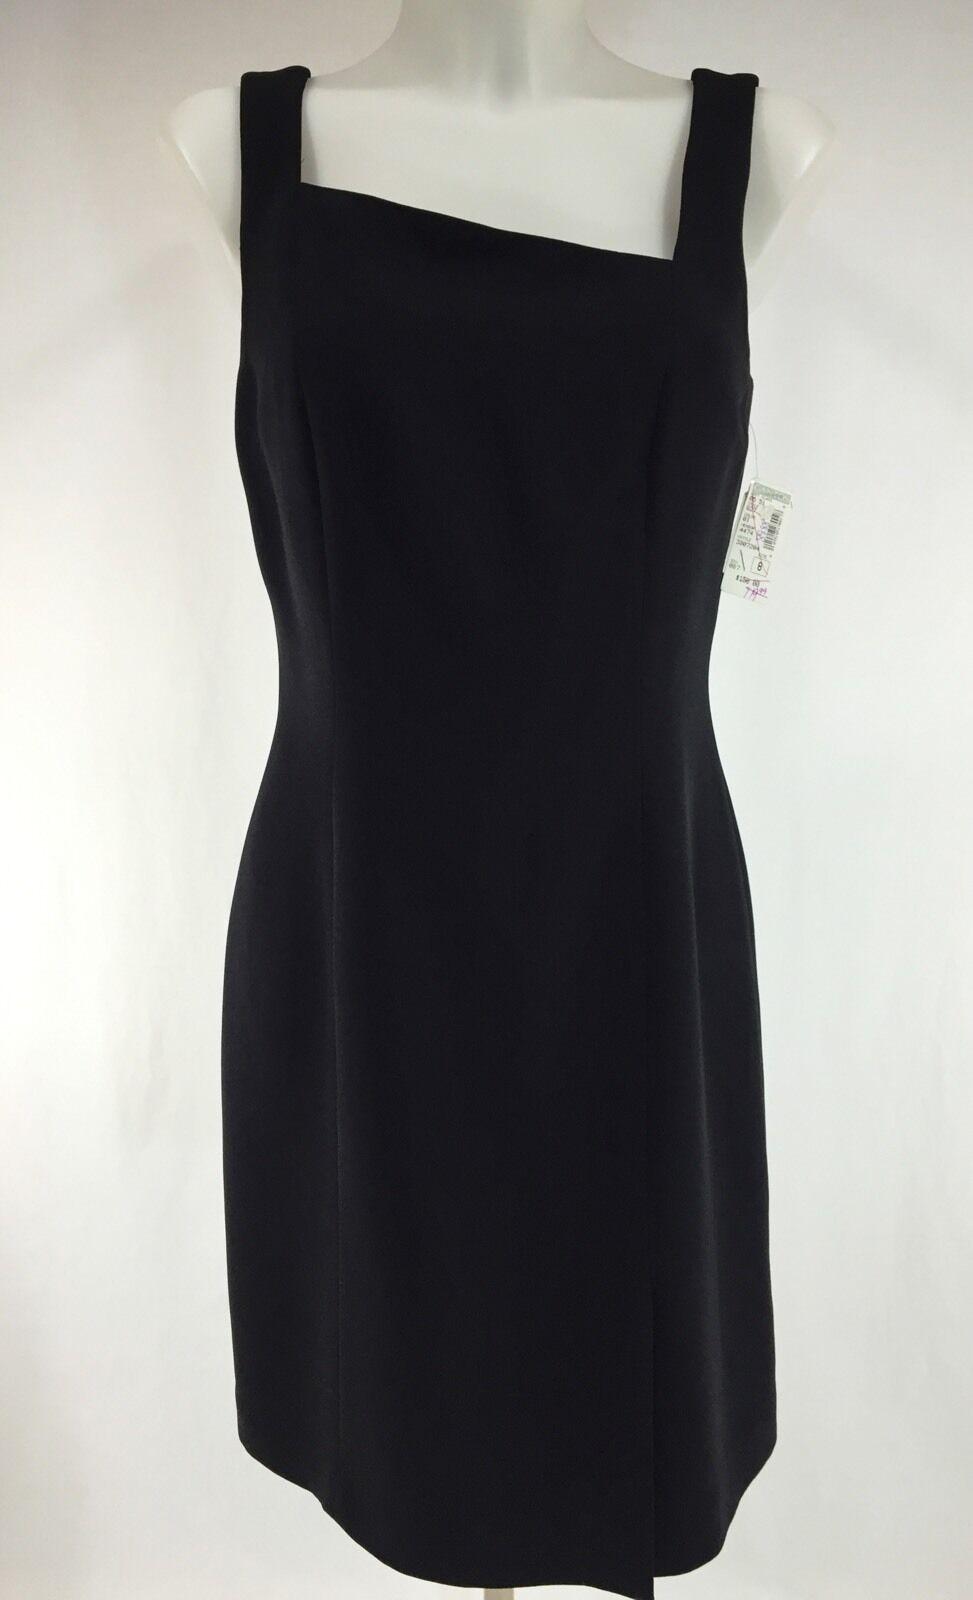 New Little schwarz Dress Größe 8 Asymmetrical Neckline Lined Sleeveless YL Yair